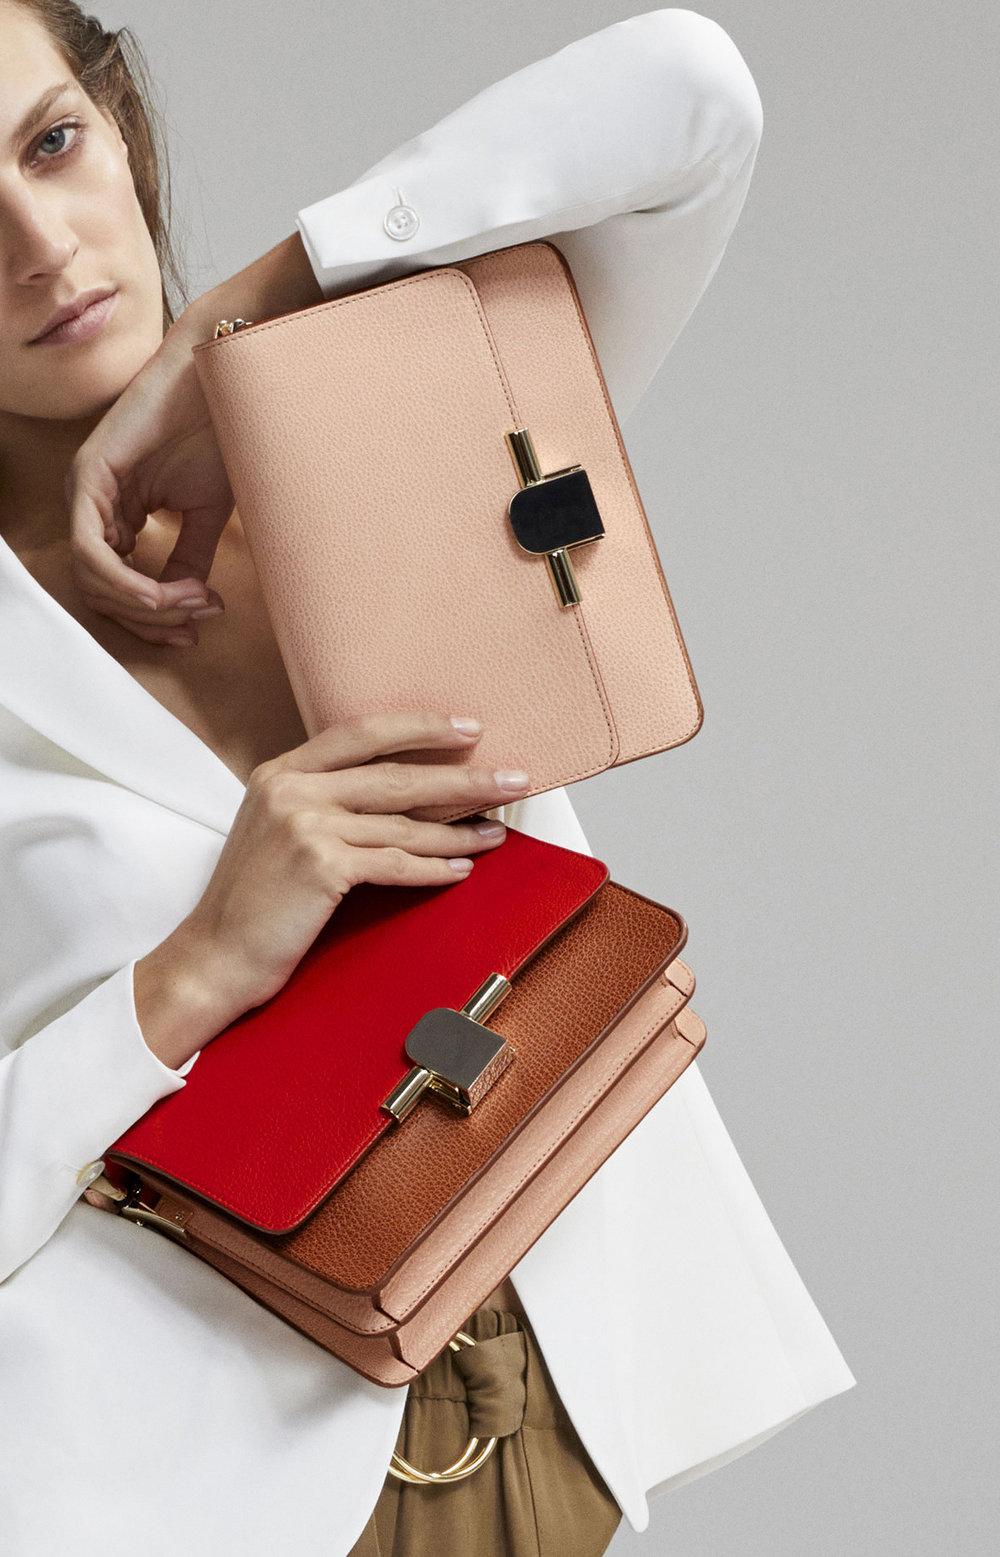 Massimo Dutti_The Iconic Bag (17).jpg